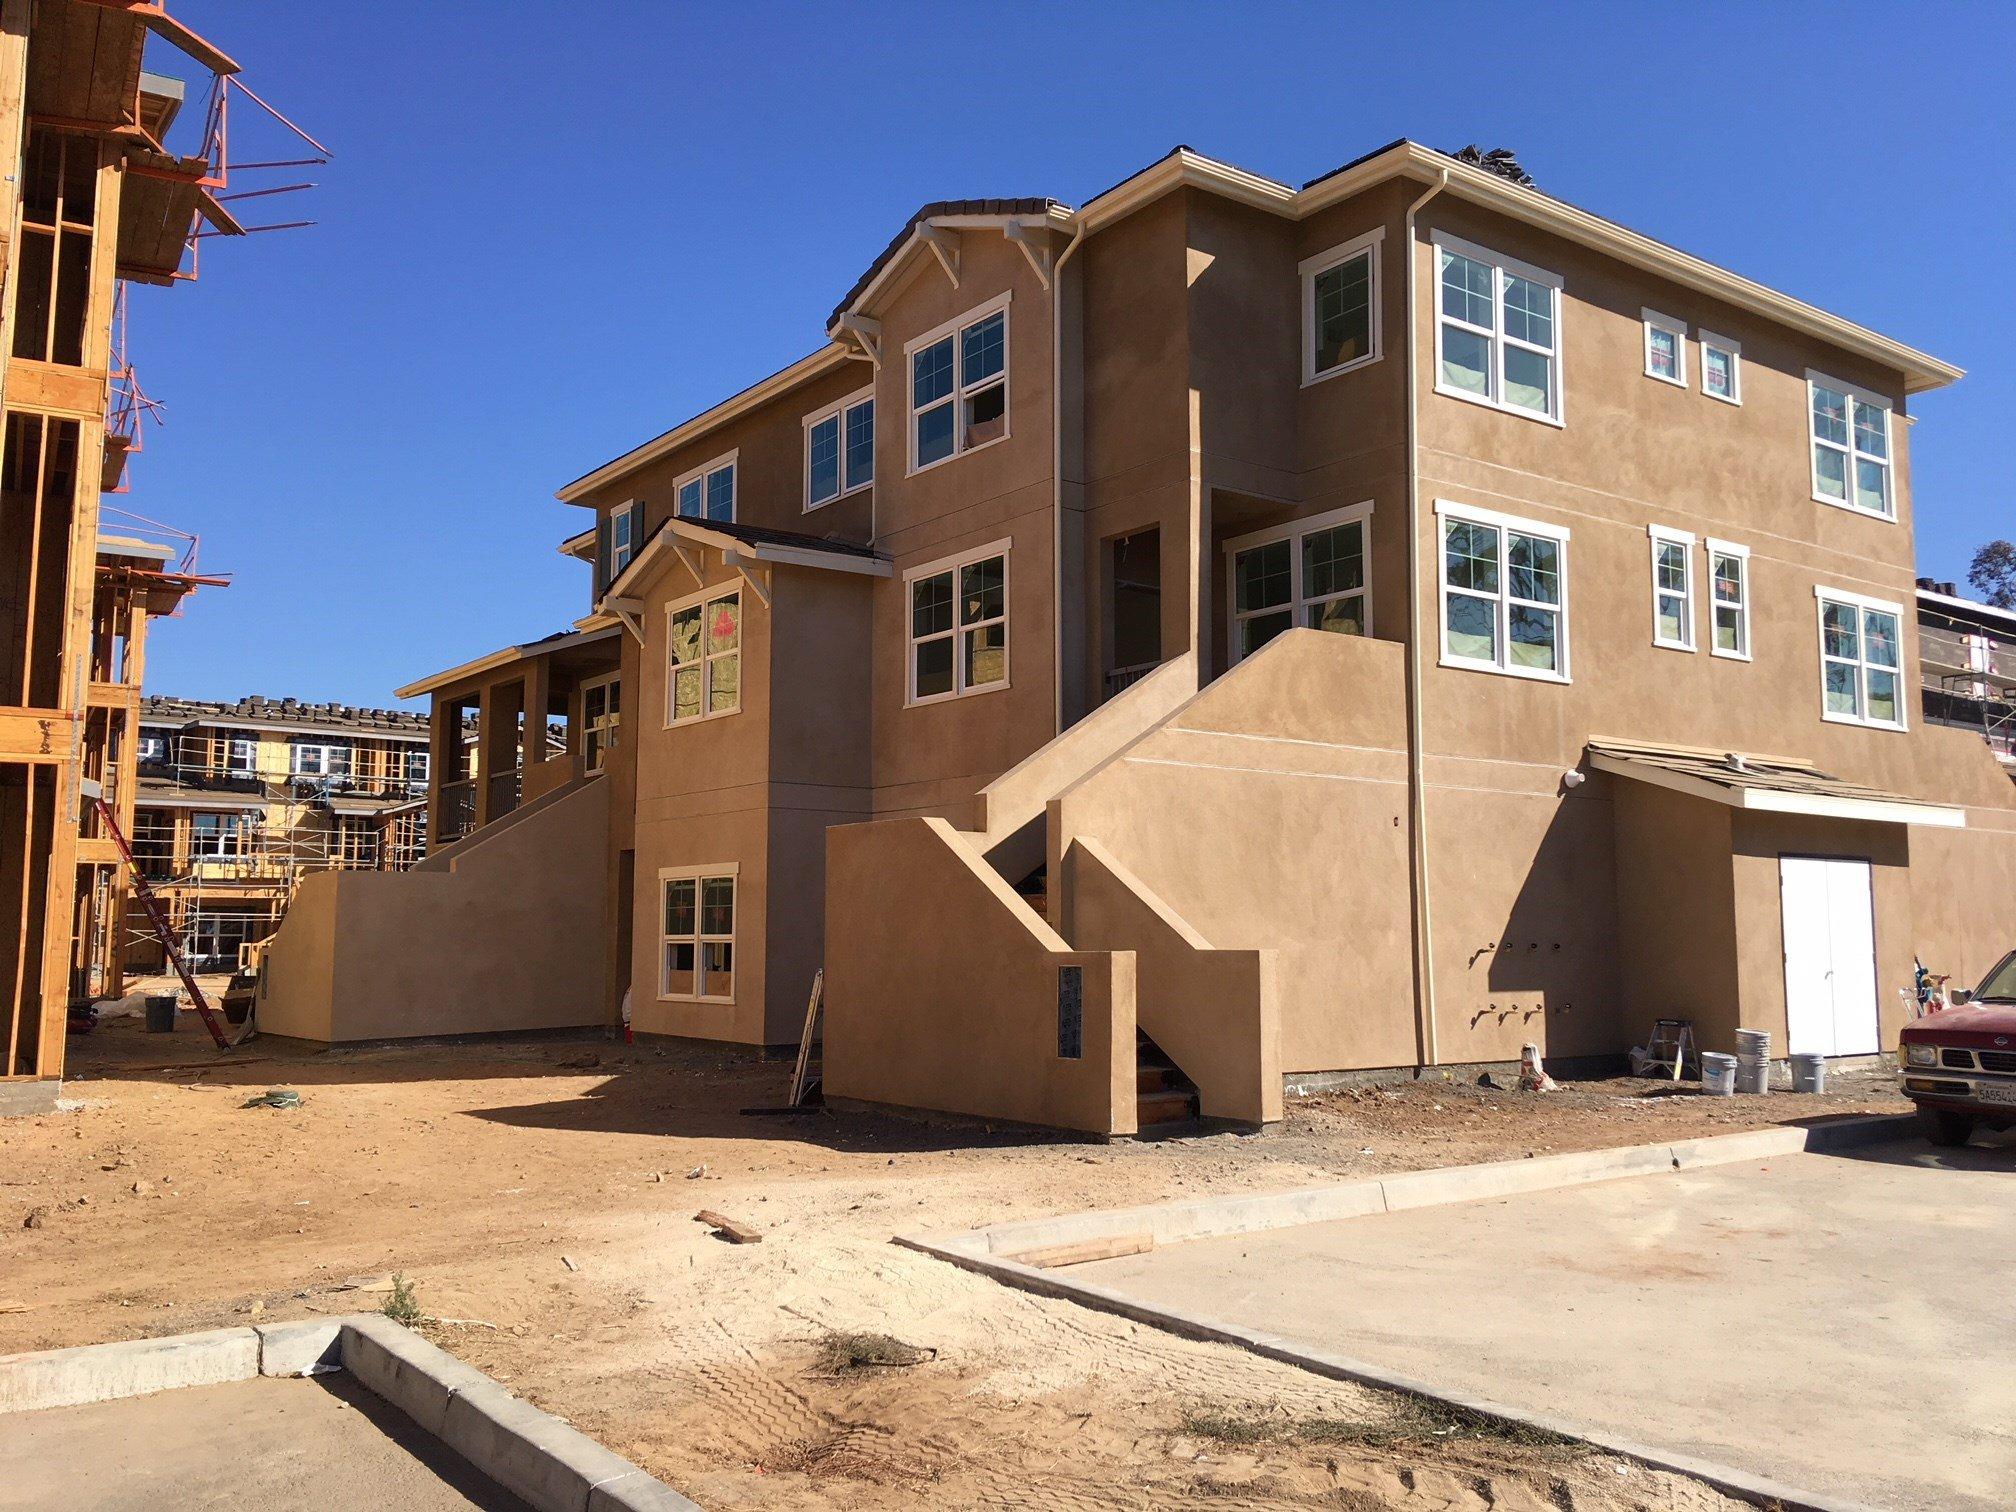 Housing developments for Casas At Los Carneros